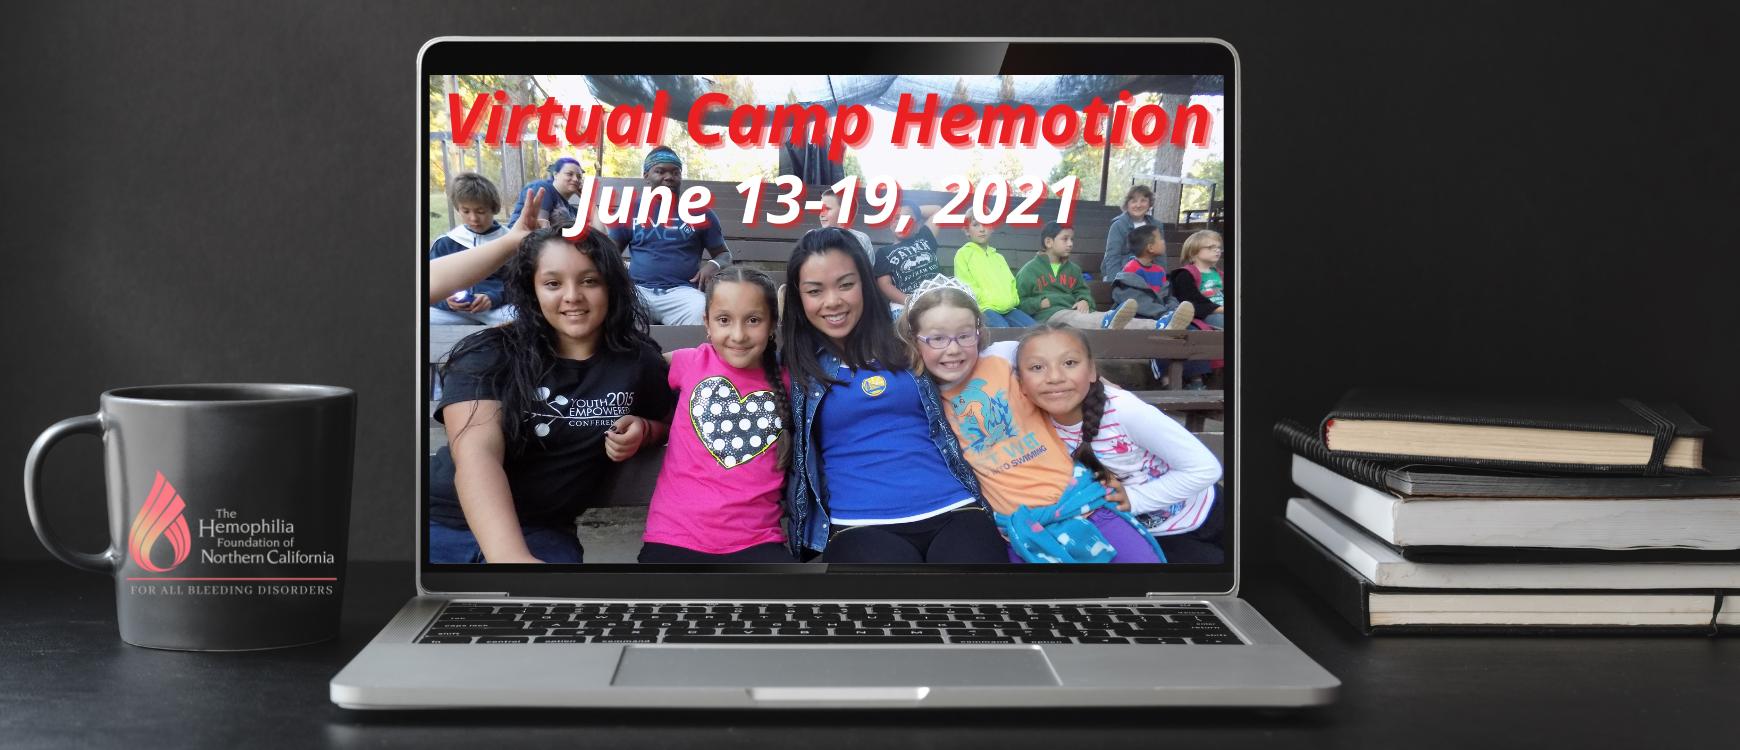 Camp Hemotion